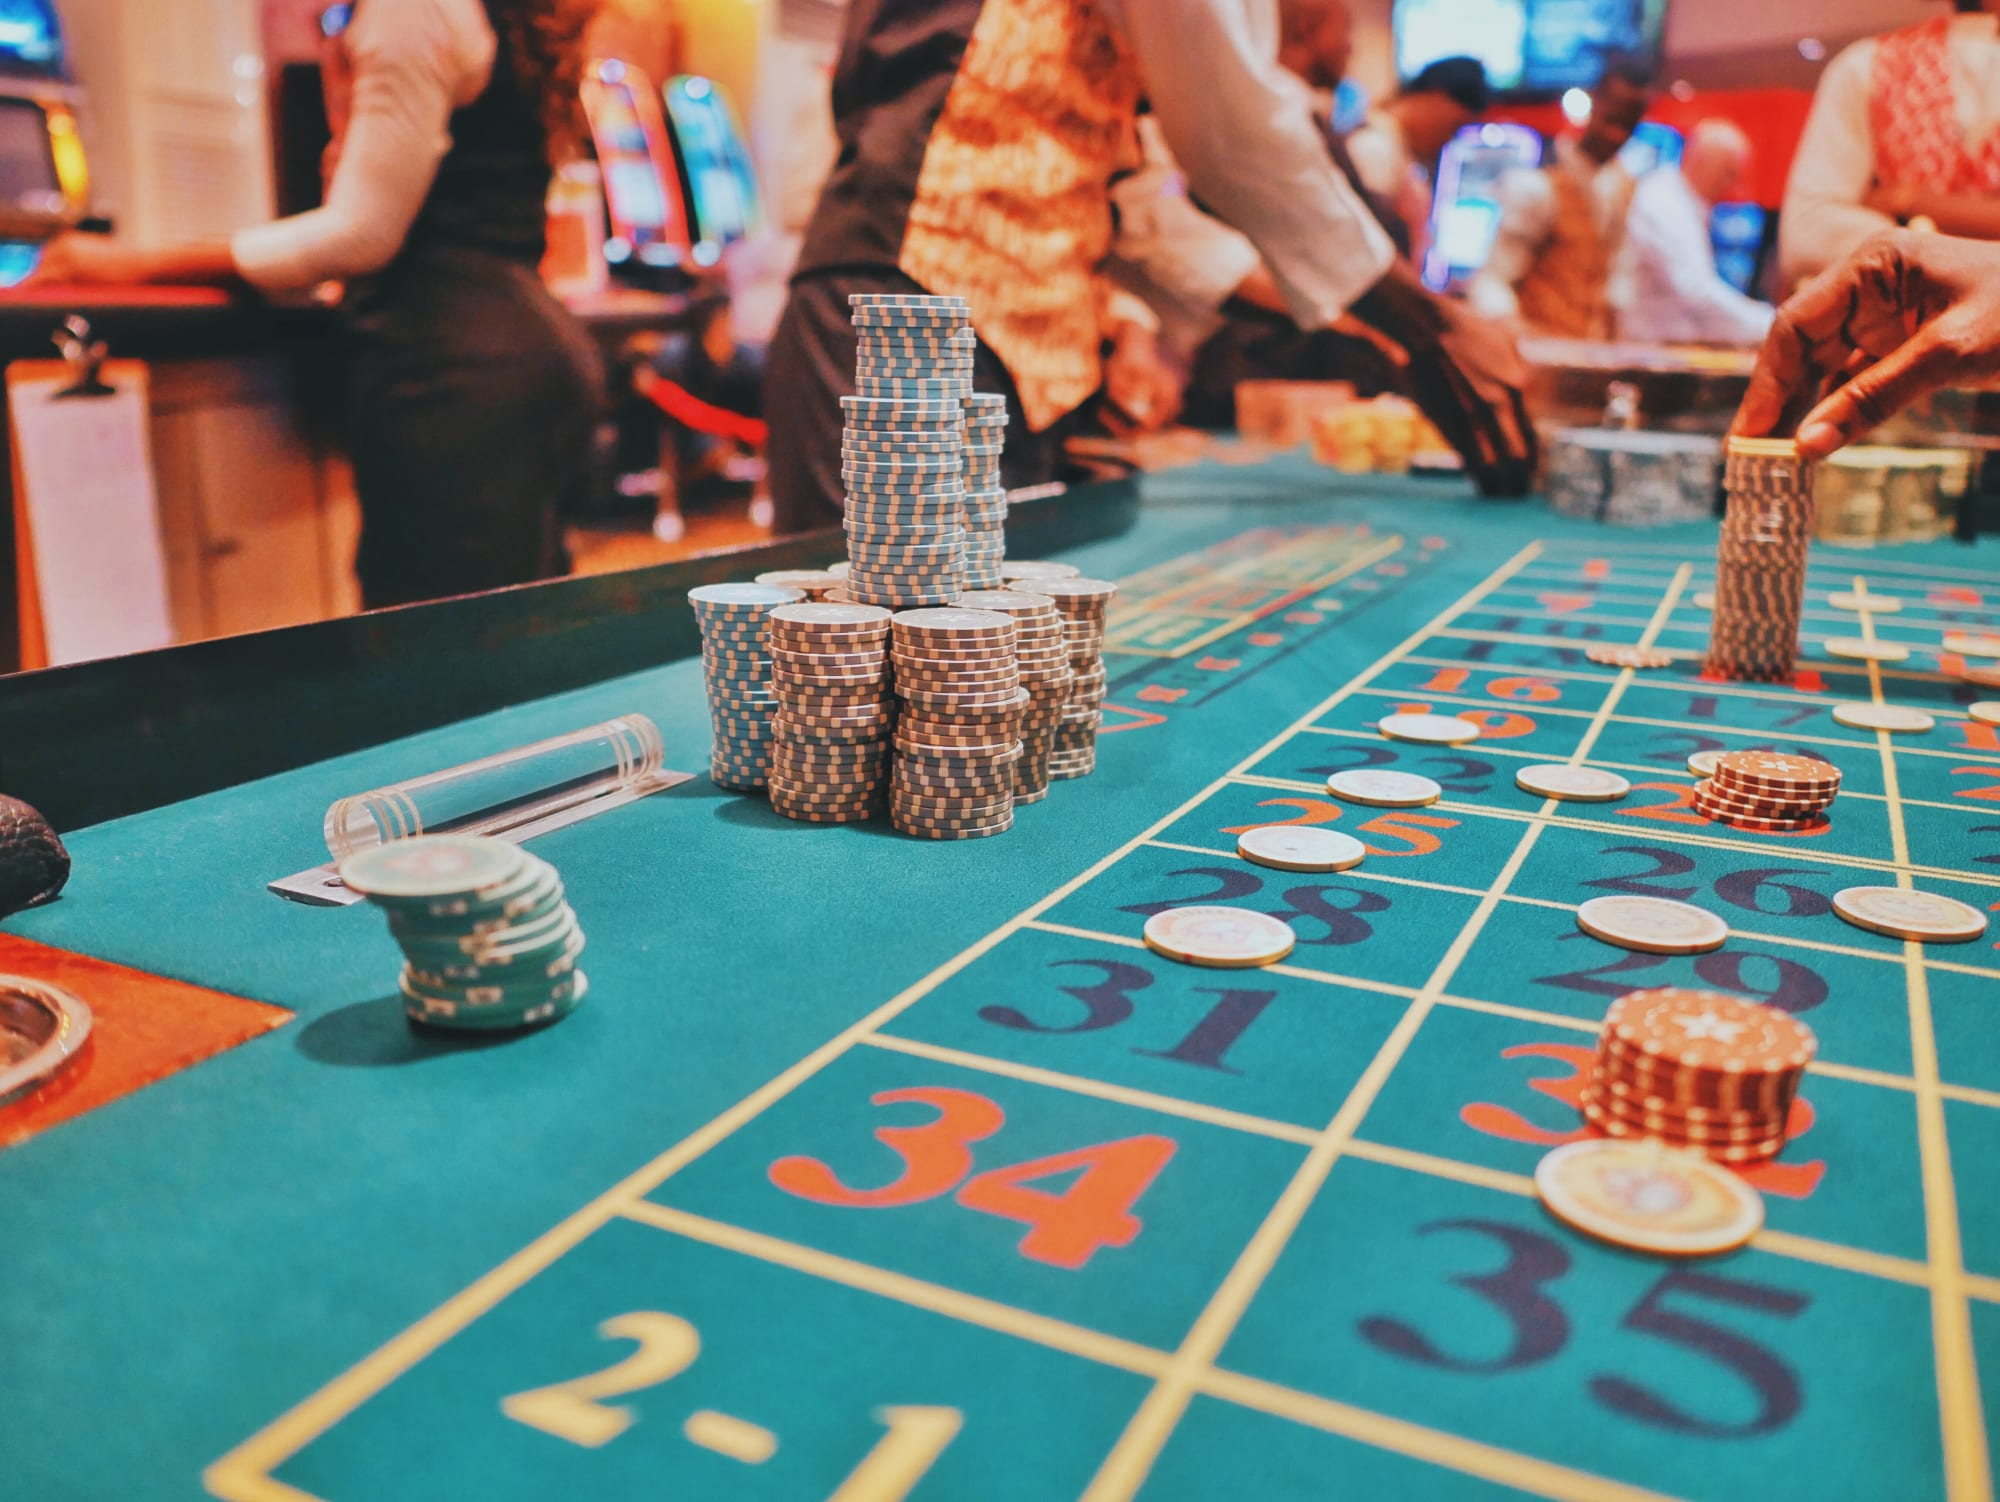 EO for Boracay casino ban not necessary— Duterte